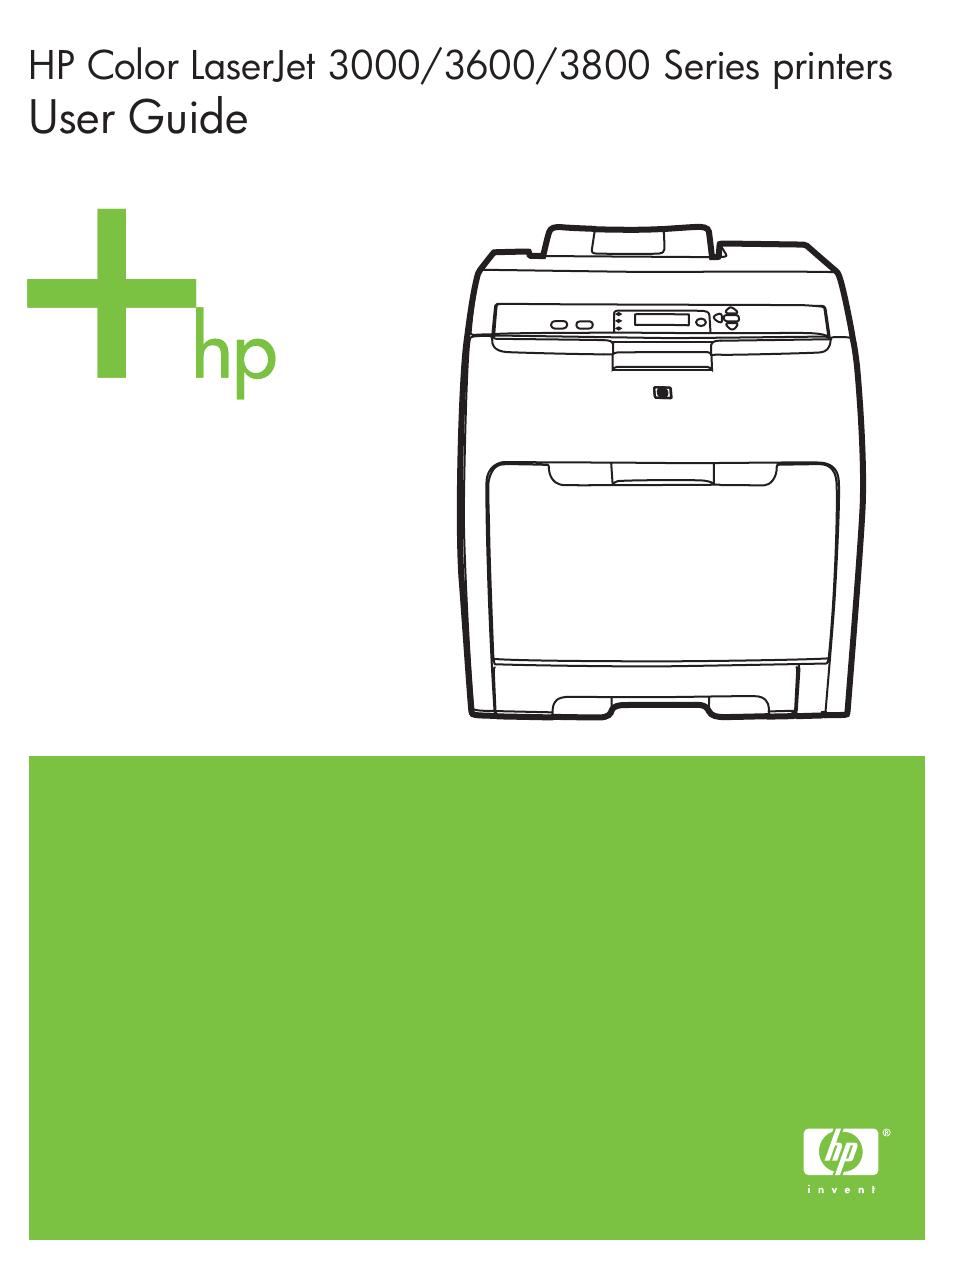 hp color laserjet 3800 printer series user manual 226 pages also rh manualsdir com HP LaserJet 1007 Cartouche HP LaserJet 3700